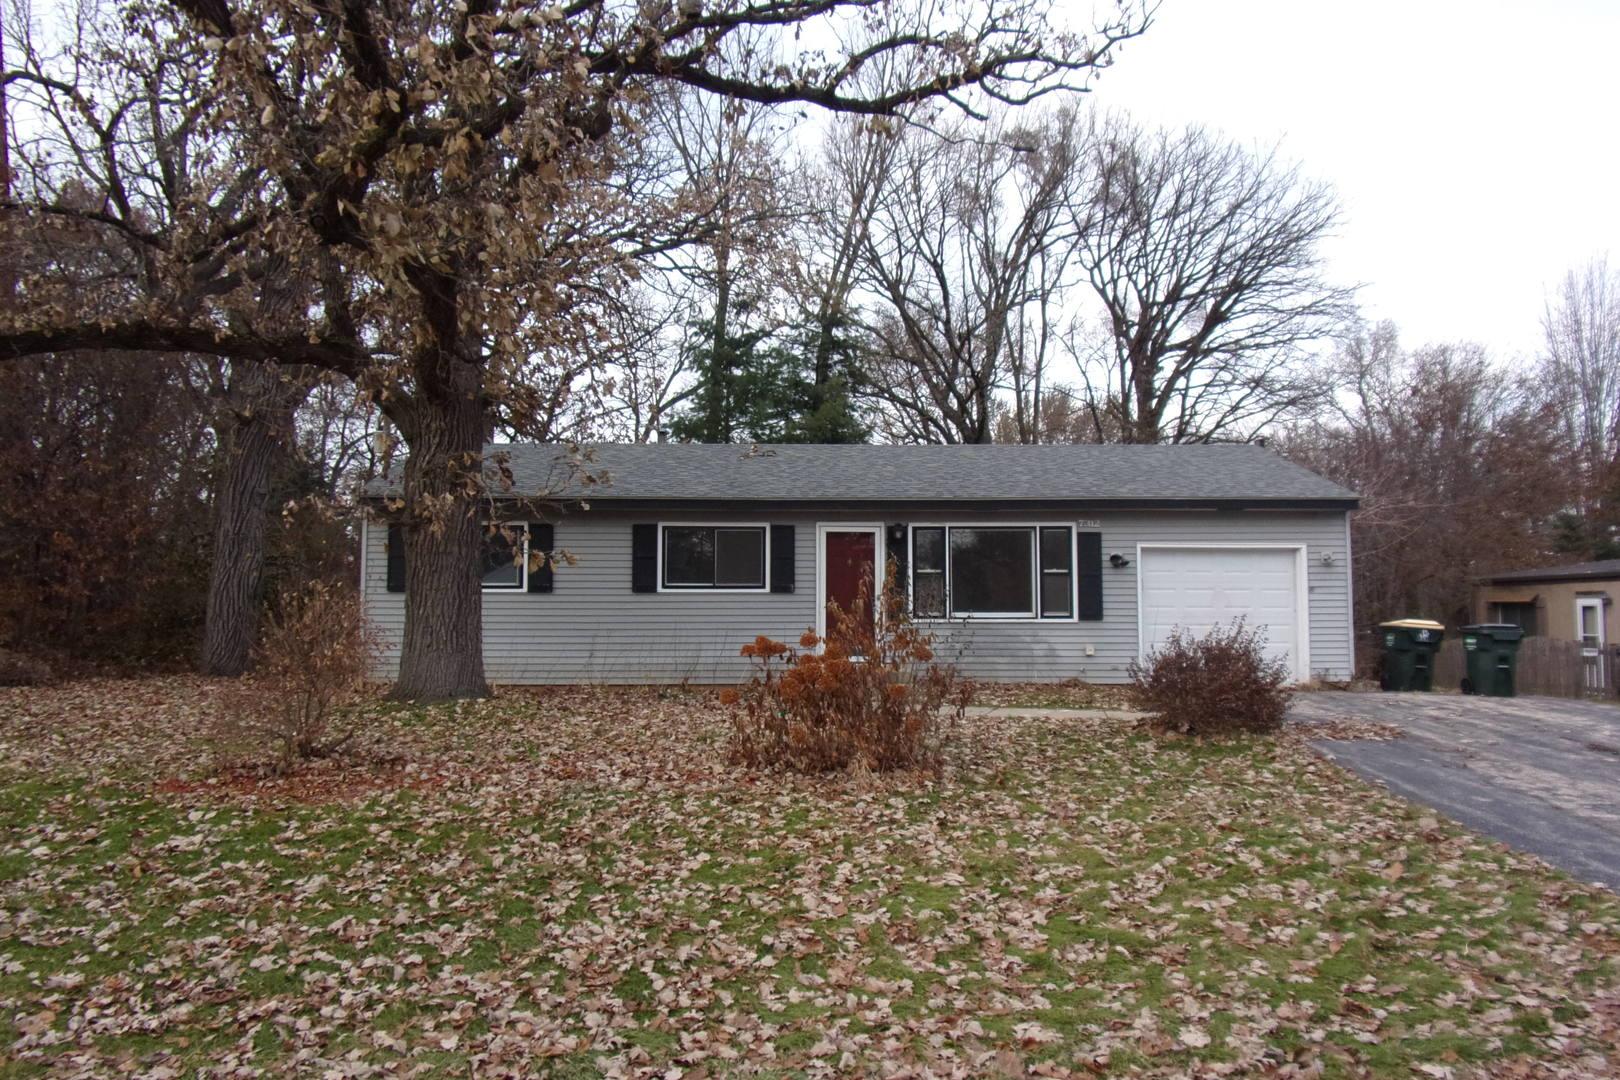 7312 Northwood, Wonder Lake, Illinois, 60097